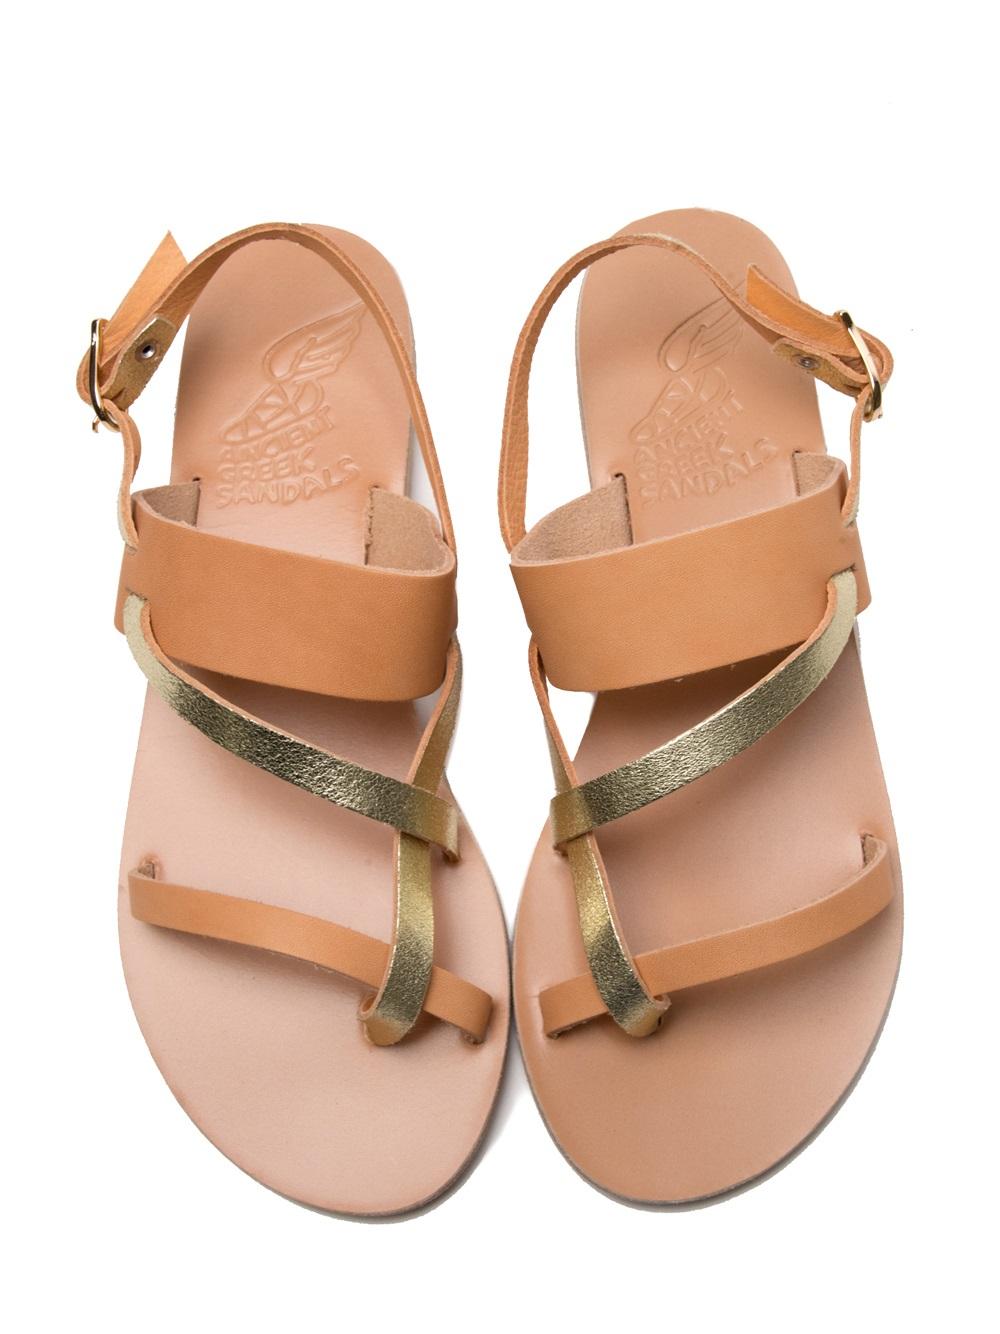 Ancient Greek Sandals Alethea Ponyhair Sandals 100% guaranteed sale online a2xPBC2Pqz